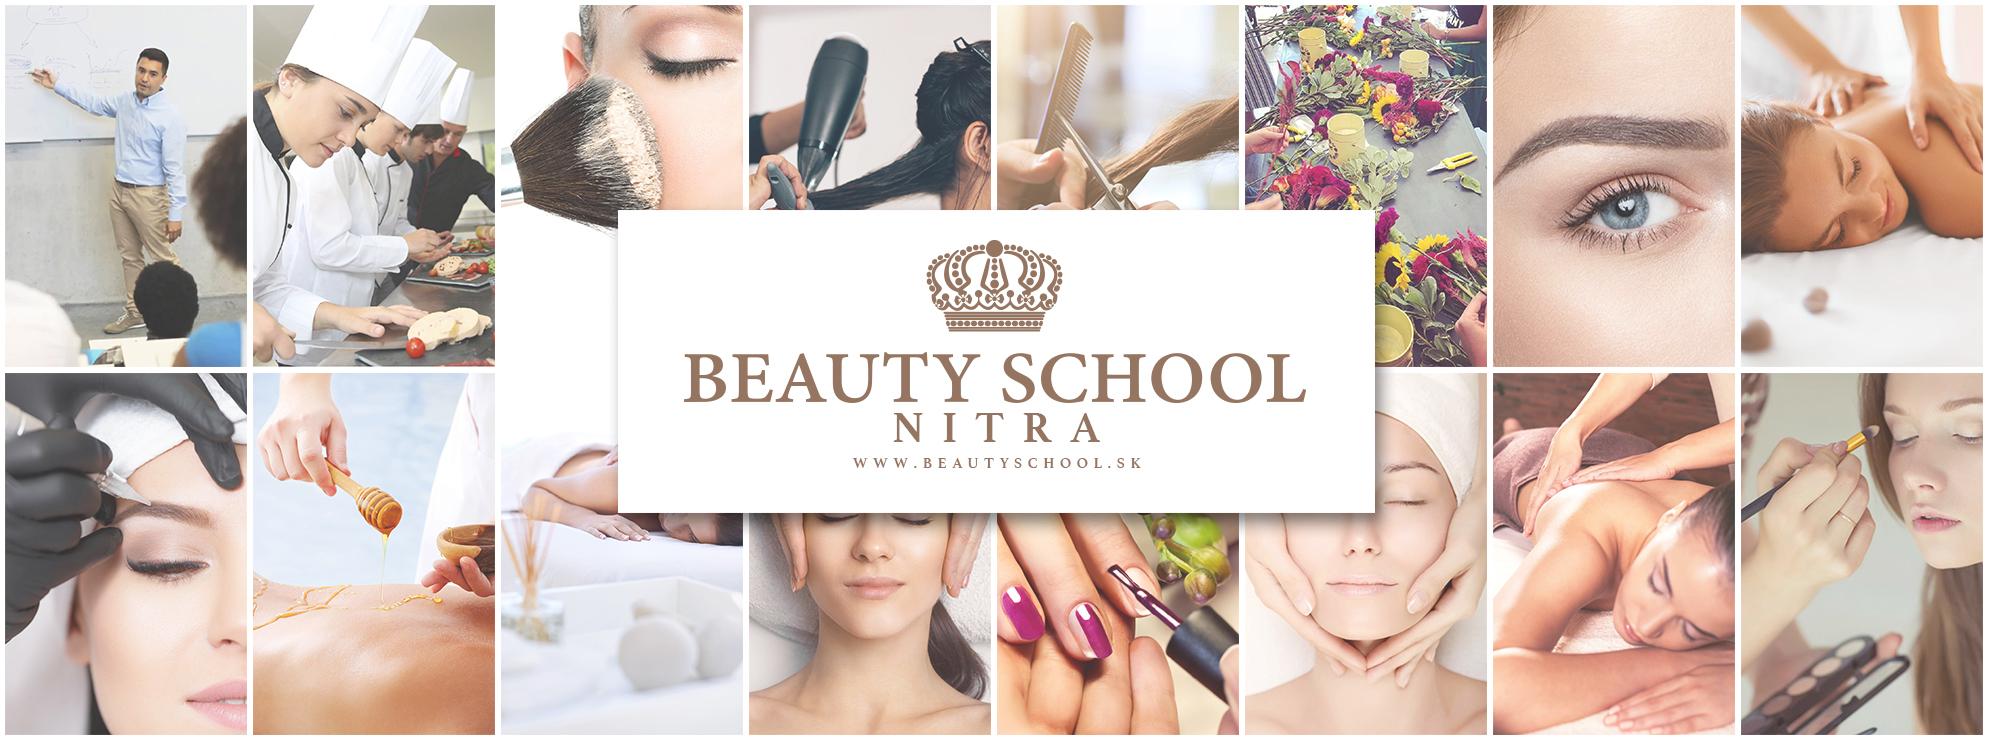 Beauty School - Nitra